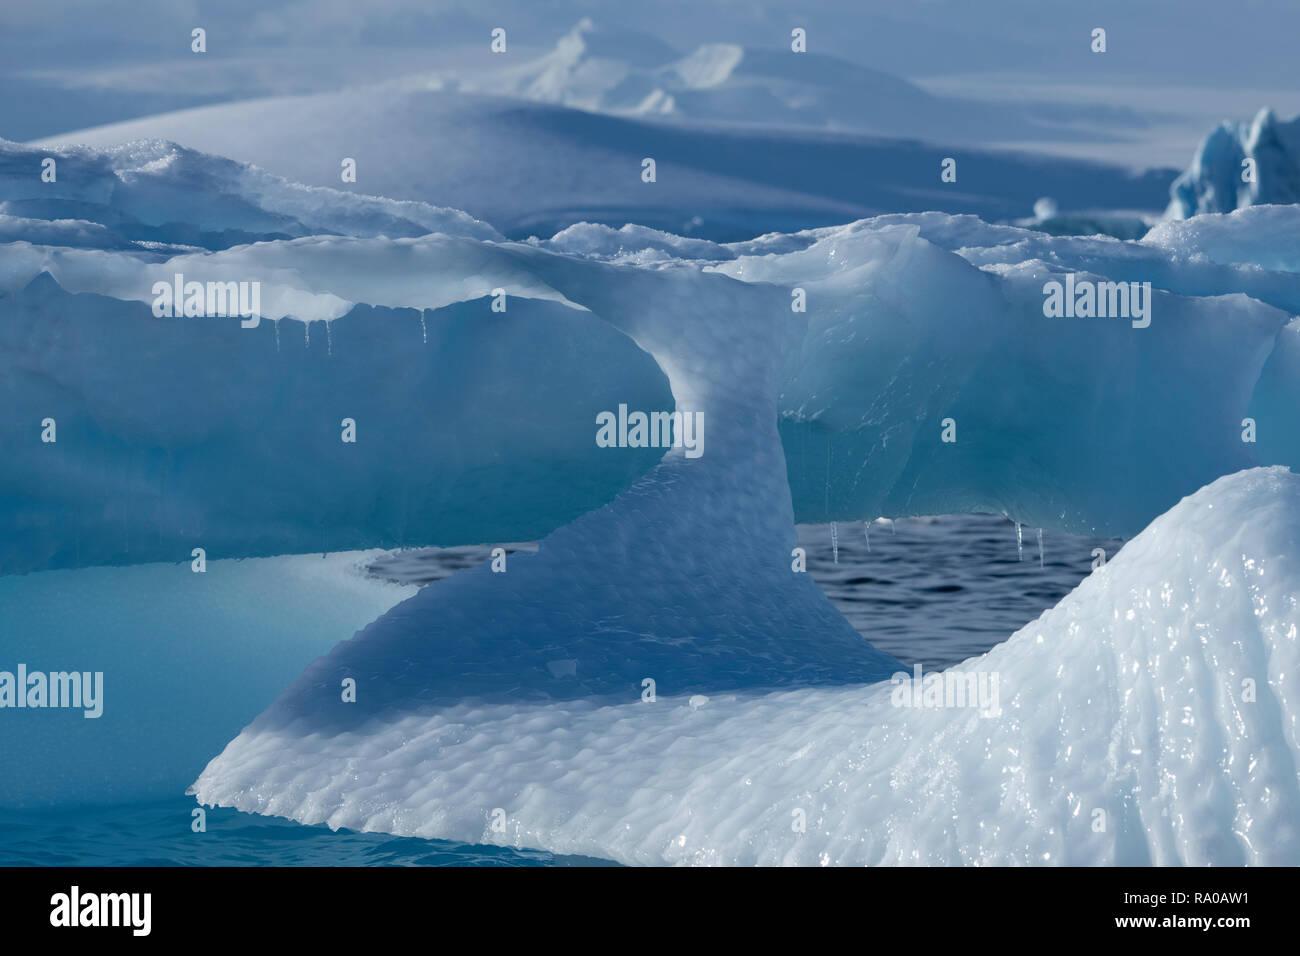 Antarctica, Antarctic peninsula, Gerlach Straight, Wilhelmina Bay in the Enterprise Island area. Stock Photo